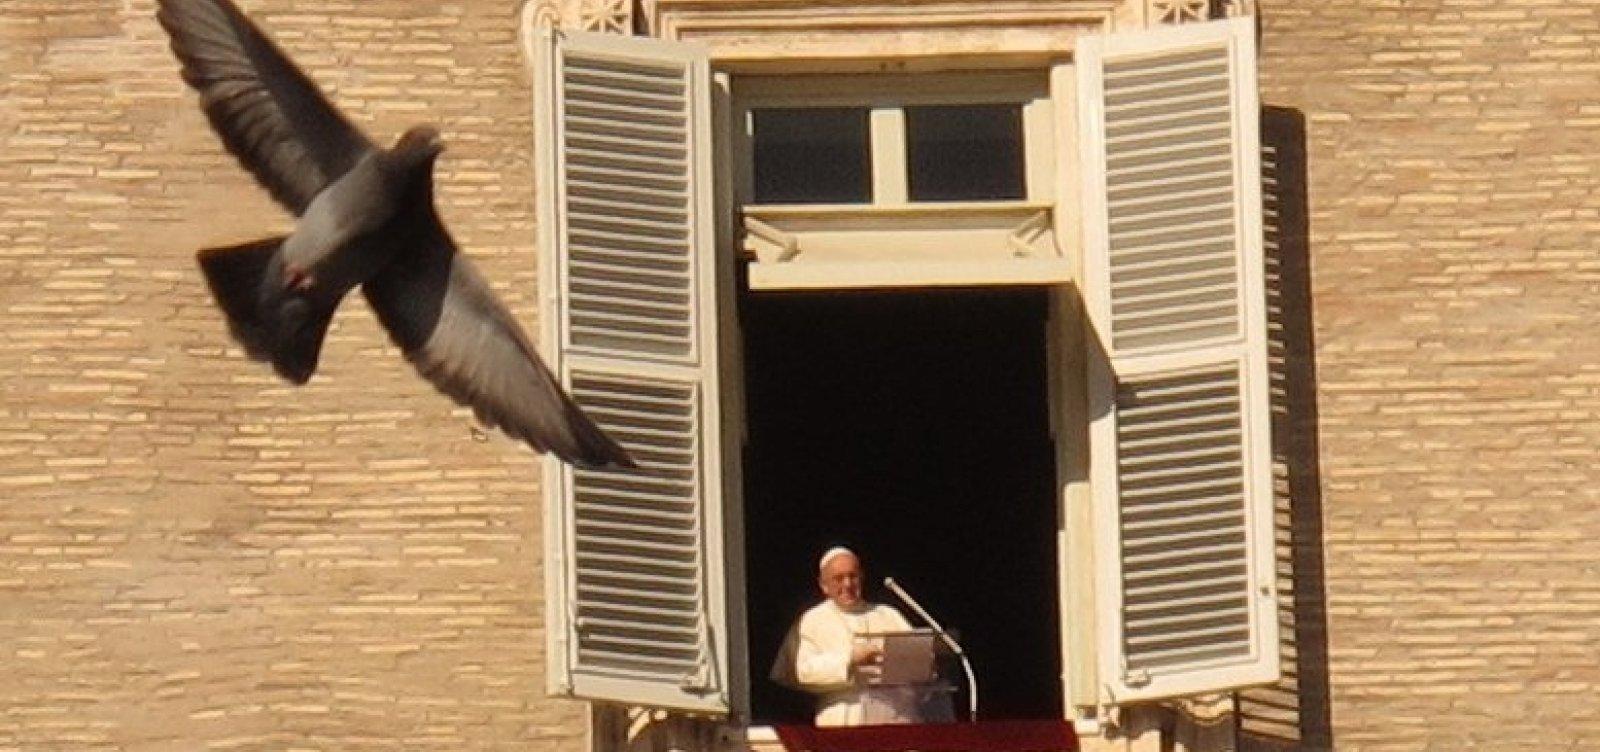 [Papa Francisco anuncia que receberá vacina contra Covid-19 na próxima semana e critica negacionistas]